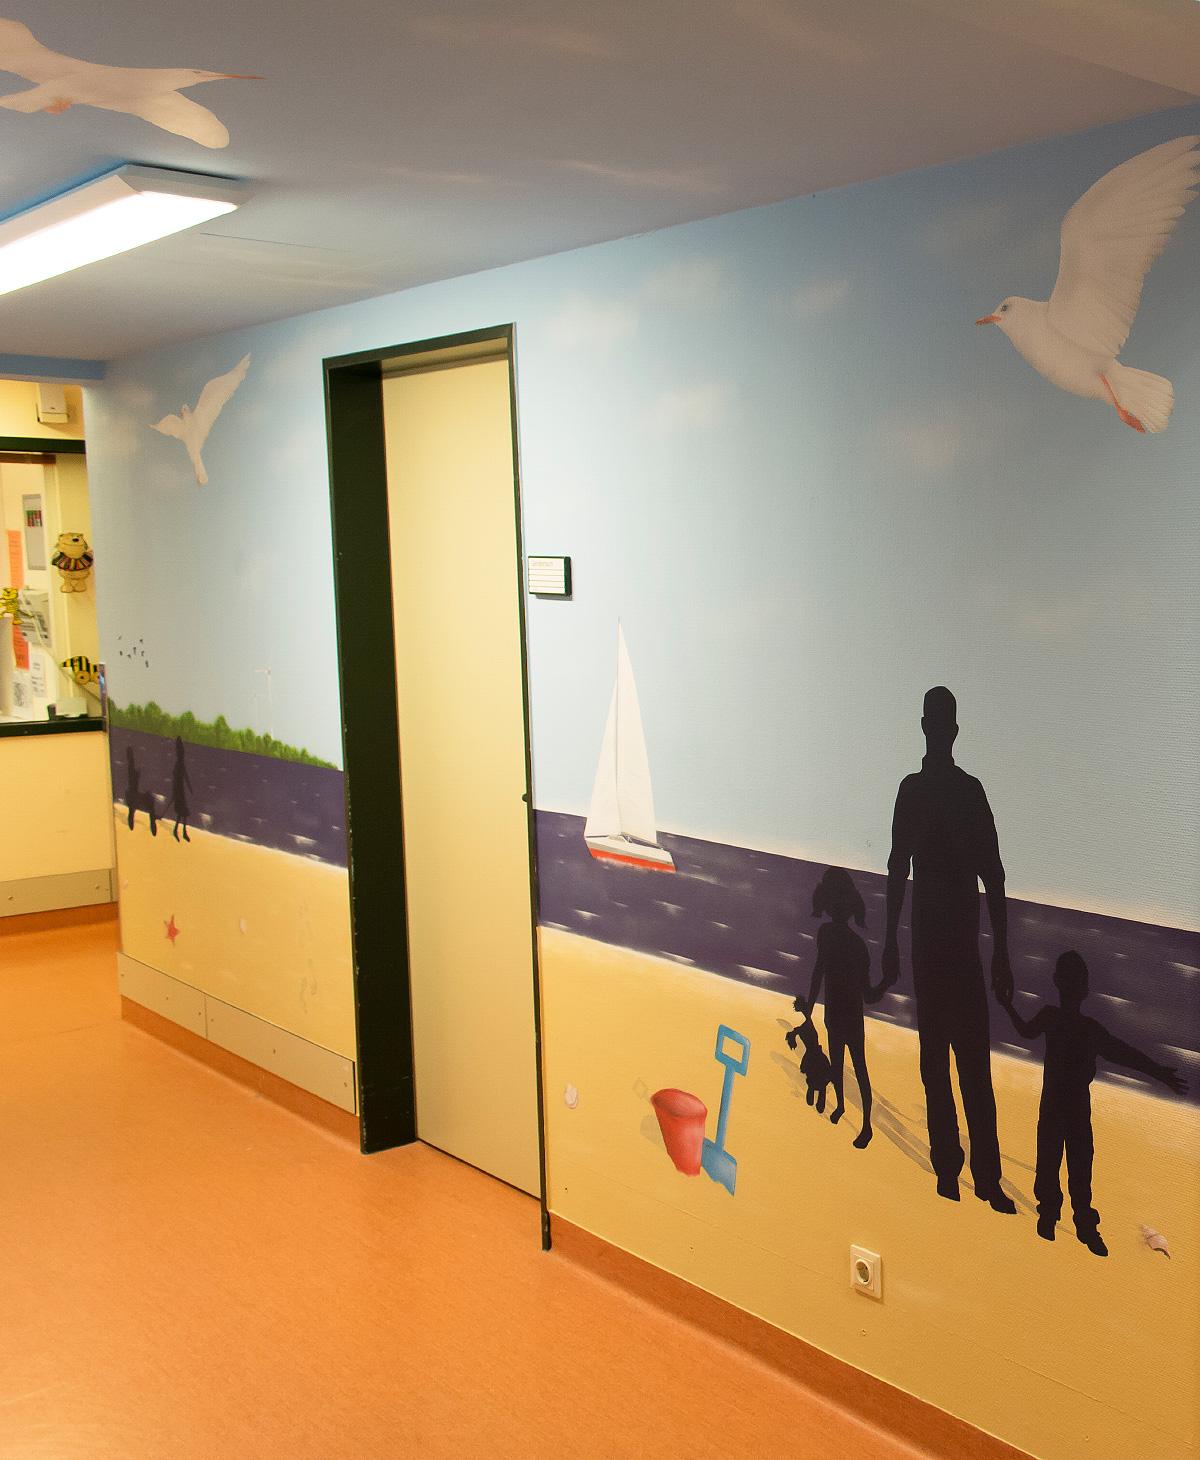 wandgestaltung_krankenhaus_graffiti_maler_05